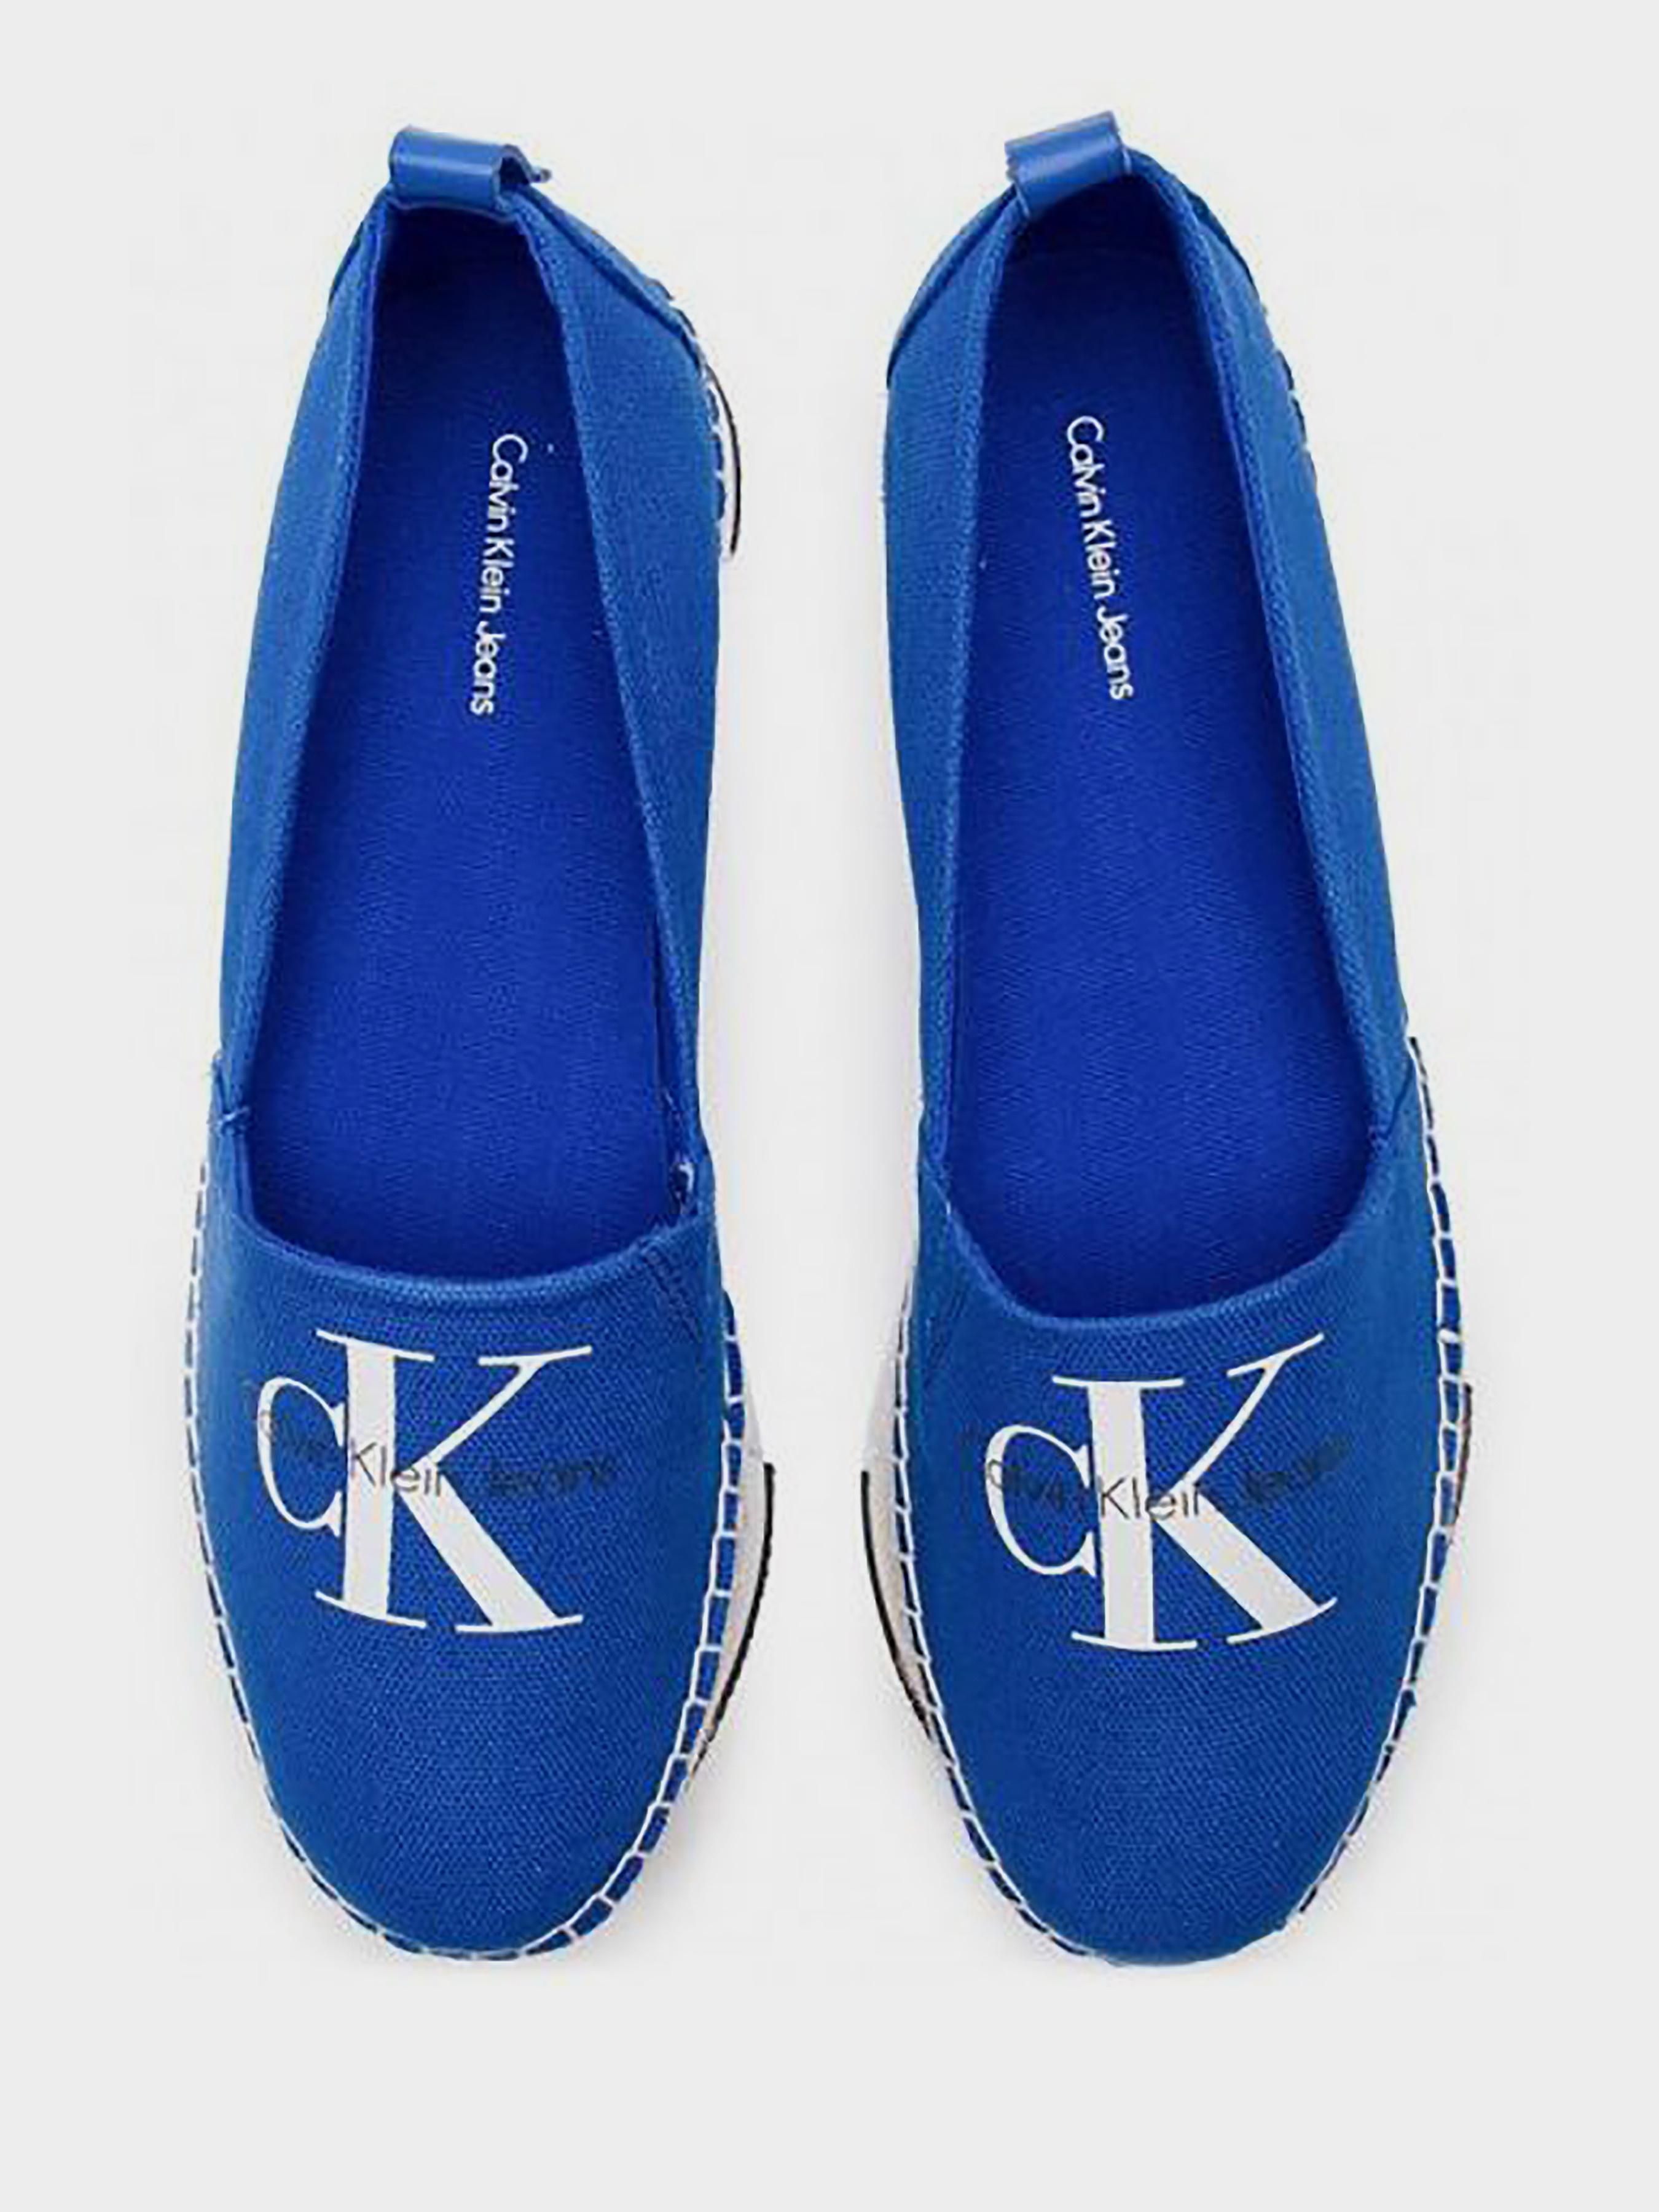 Cлипоны для женщин Calvin Klein Jeans 3Y86 Заказать, 2017